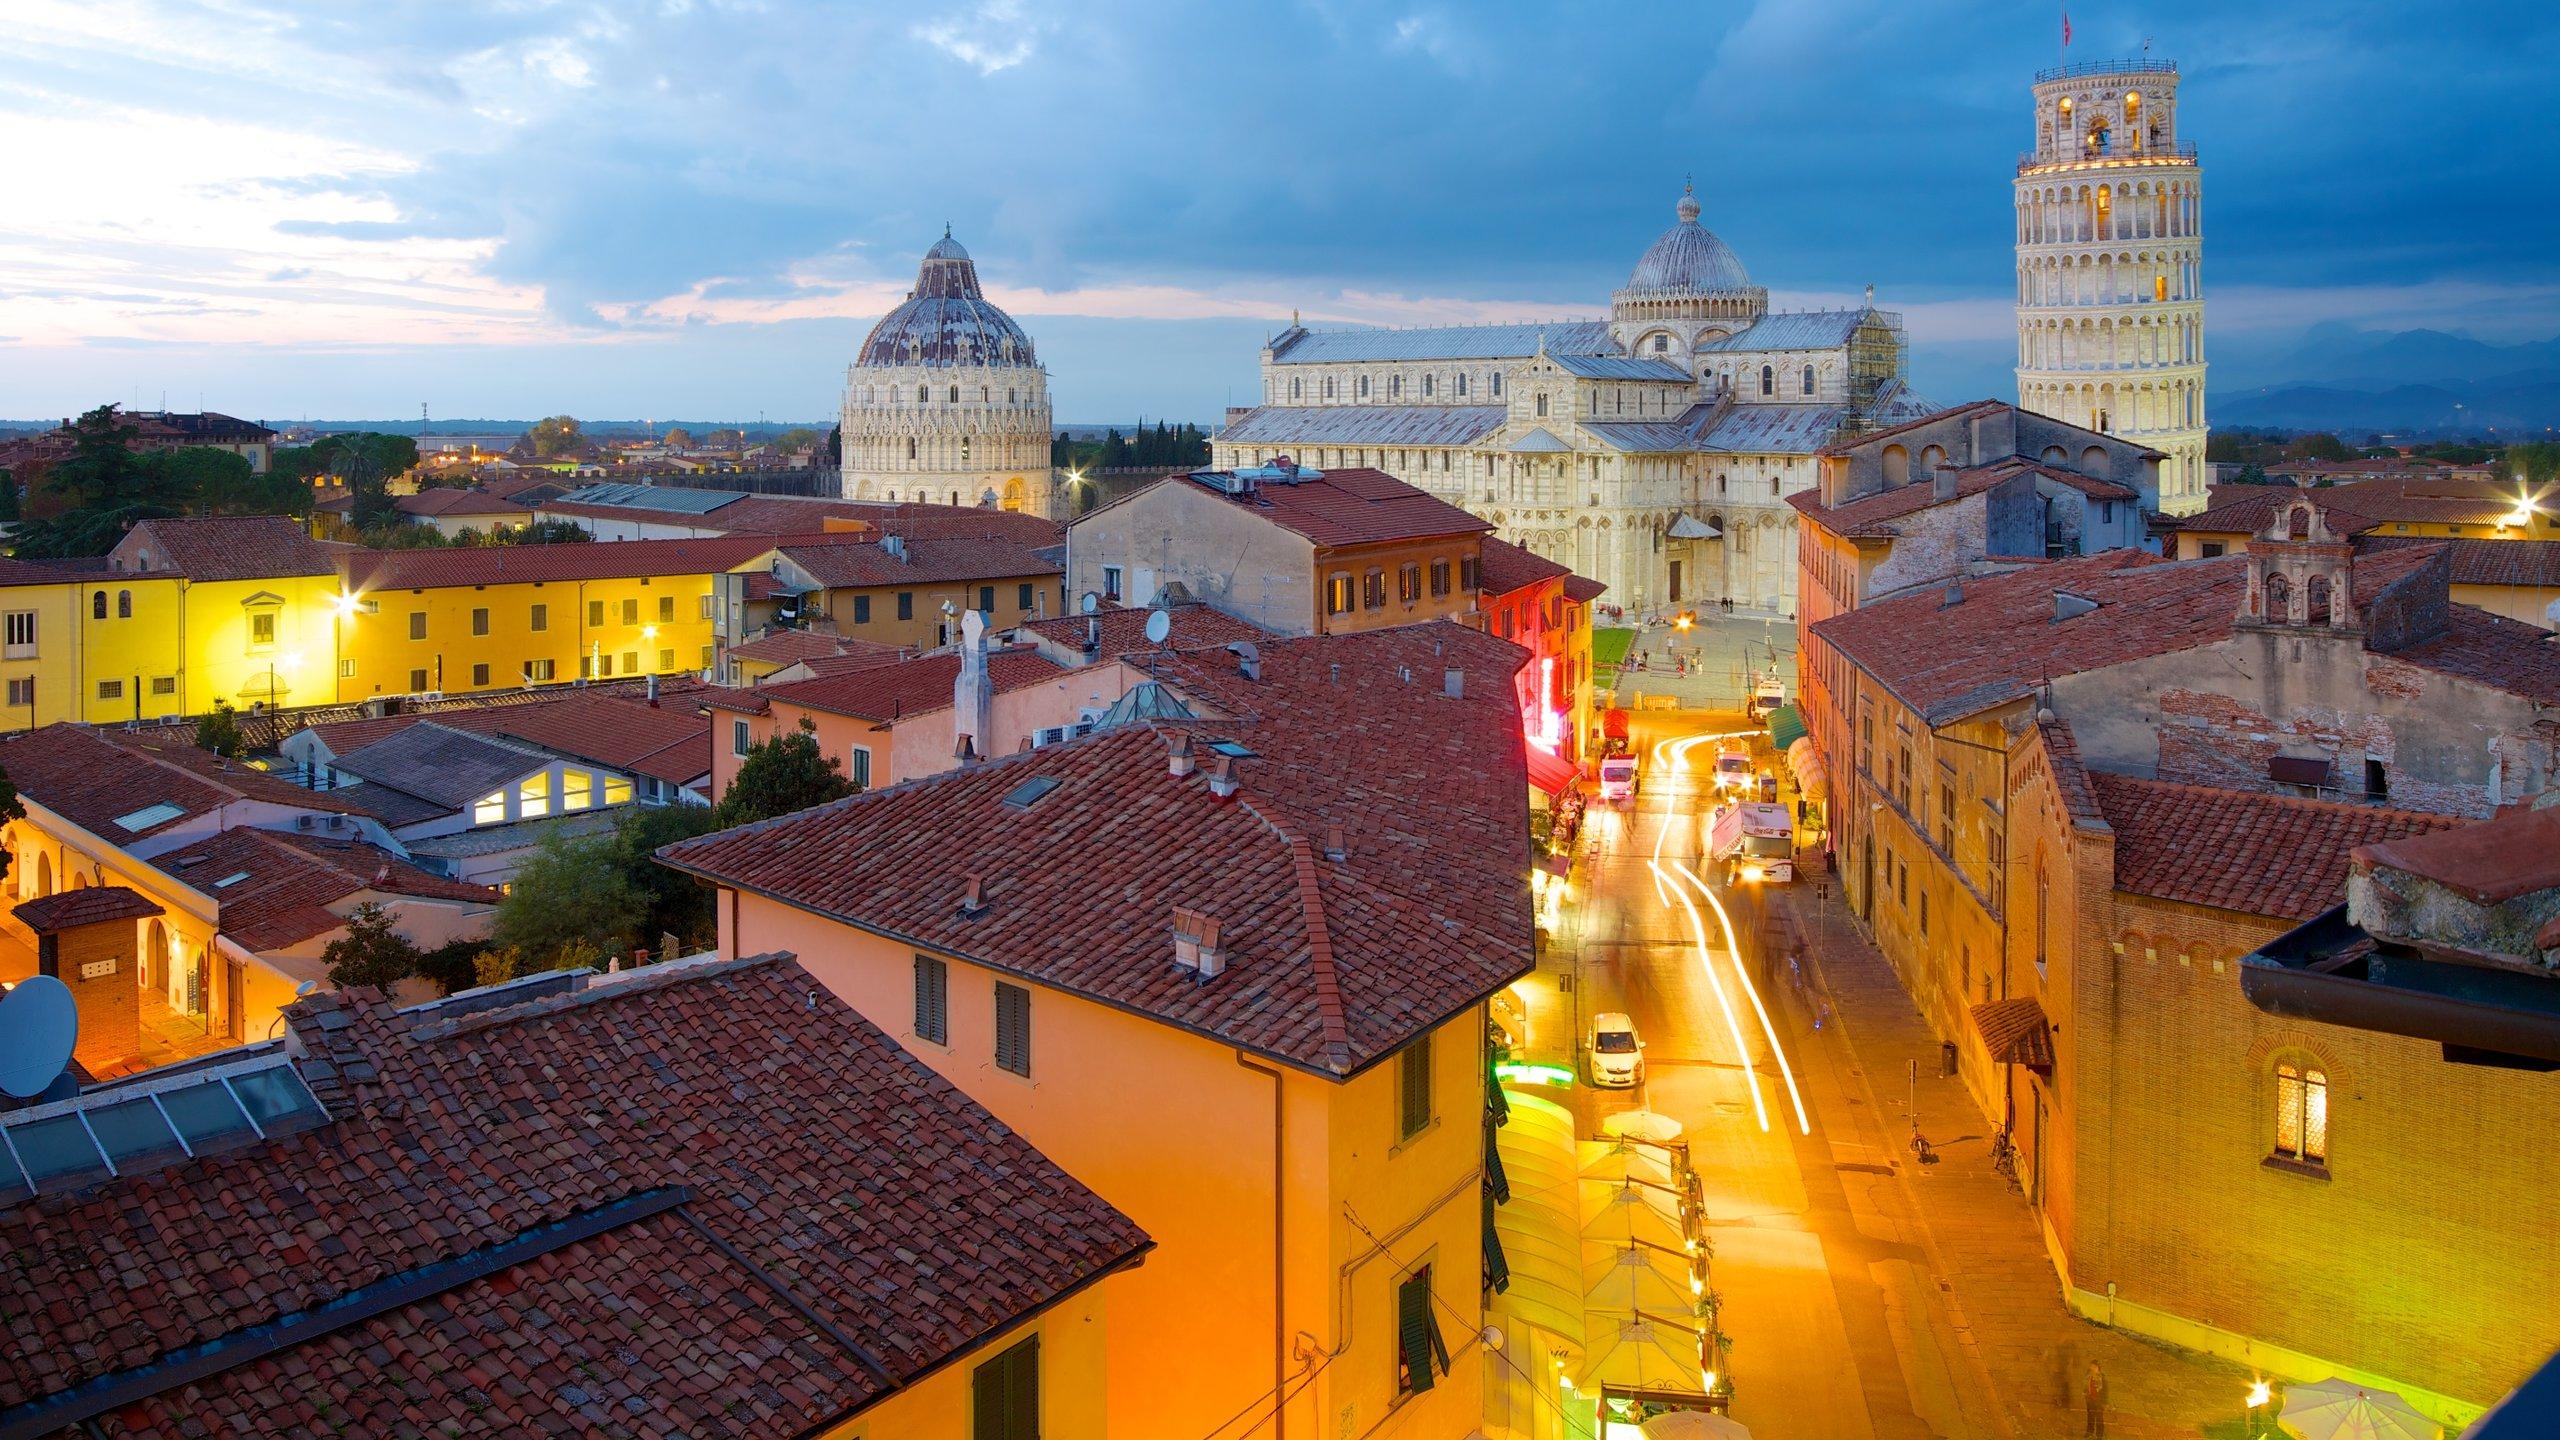 Province de Pise, Italie